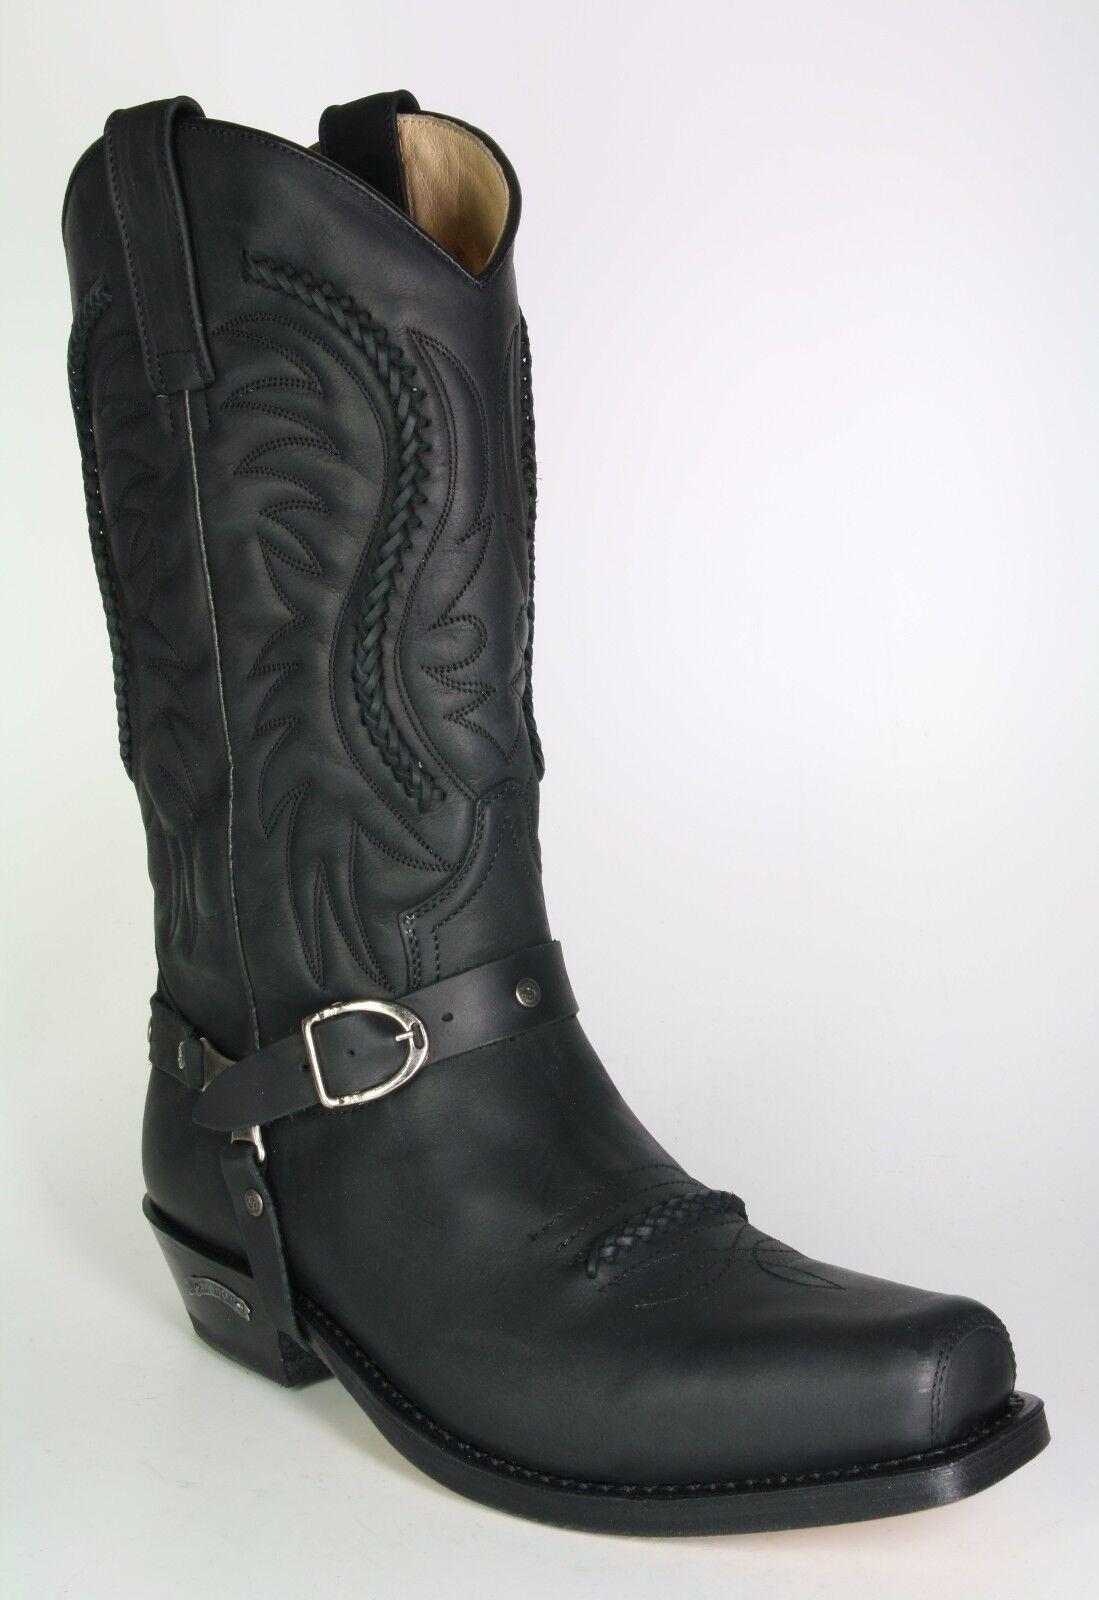 3434 sendra bottes de cowboy Monténégro noir biker bottes bottes de cowboy